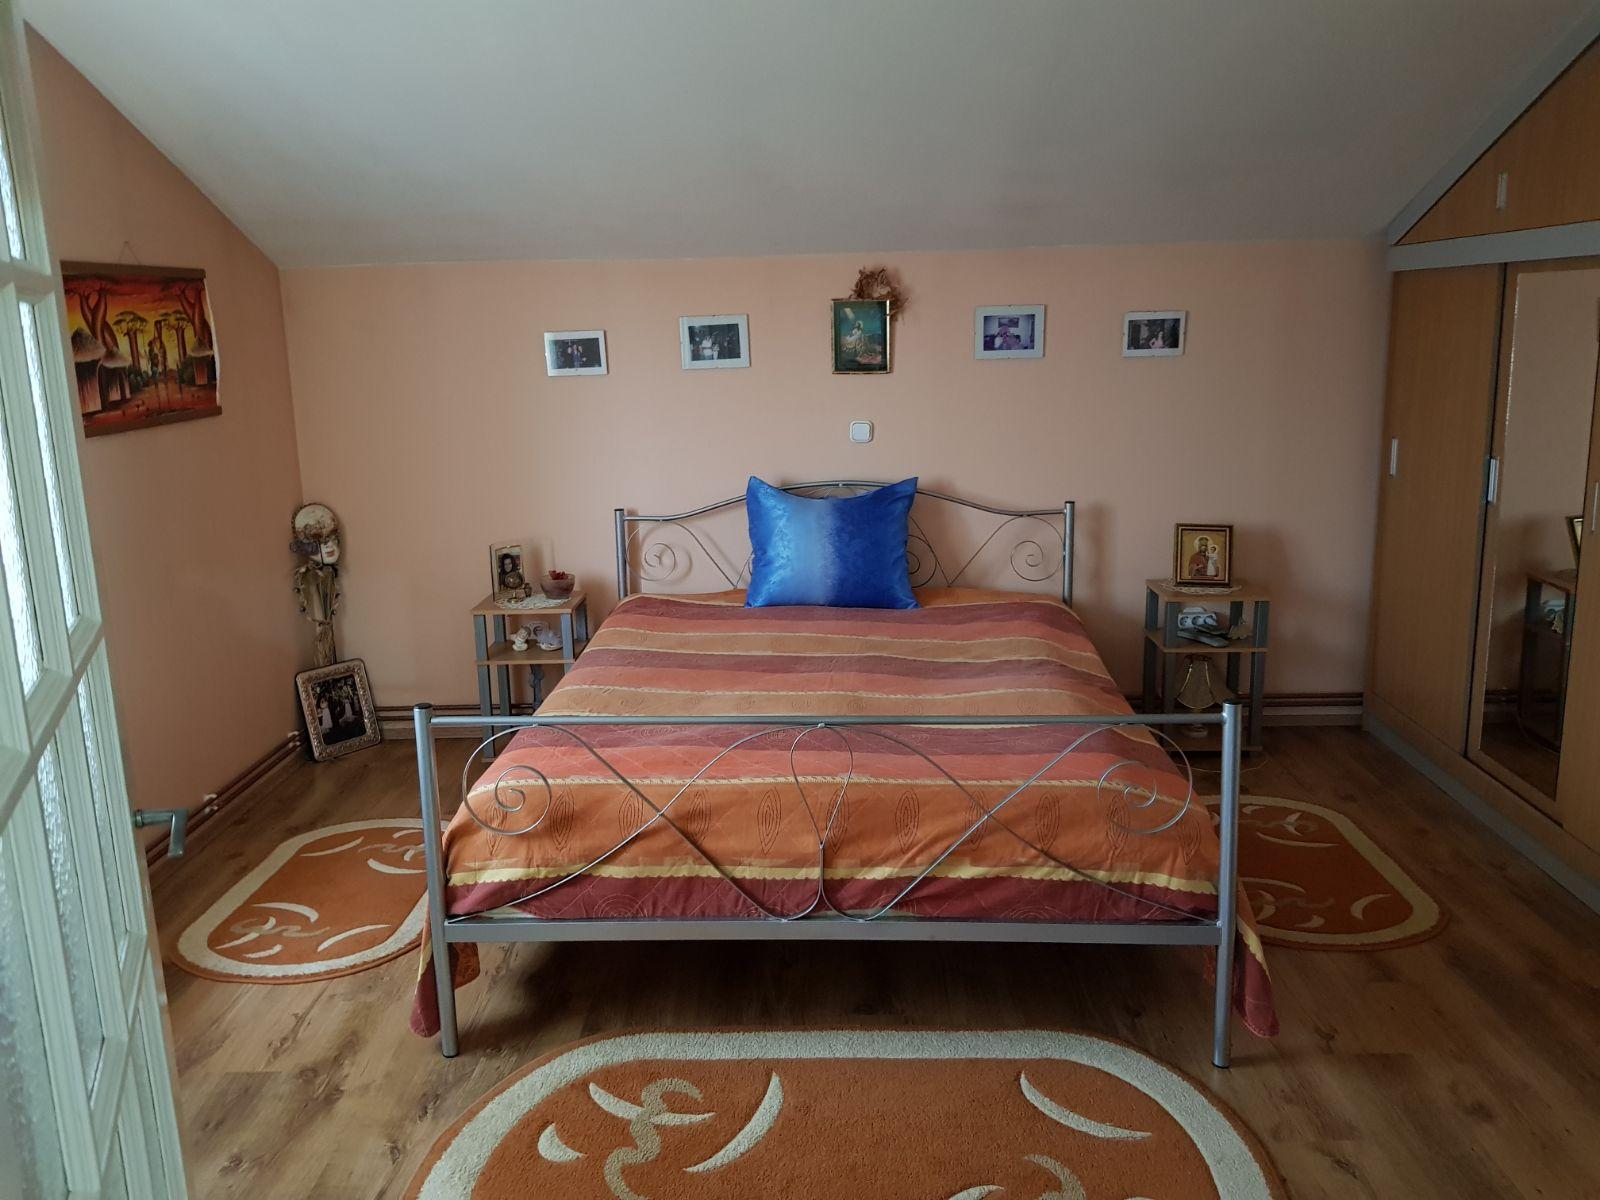 Vand casa 5 camere zona Aradul Nou-Constitutiei